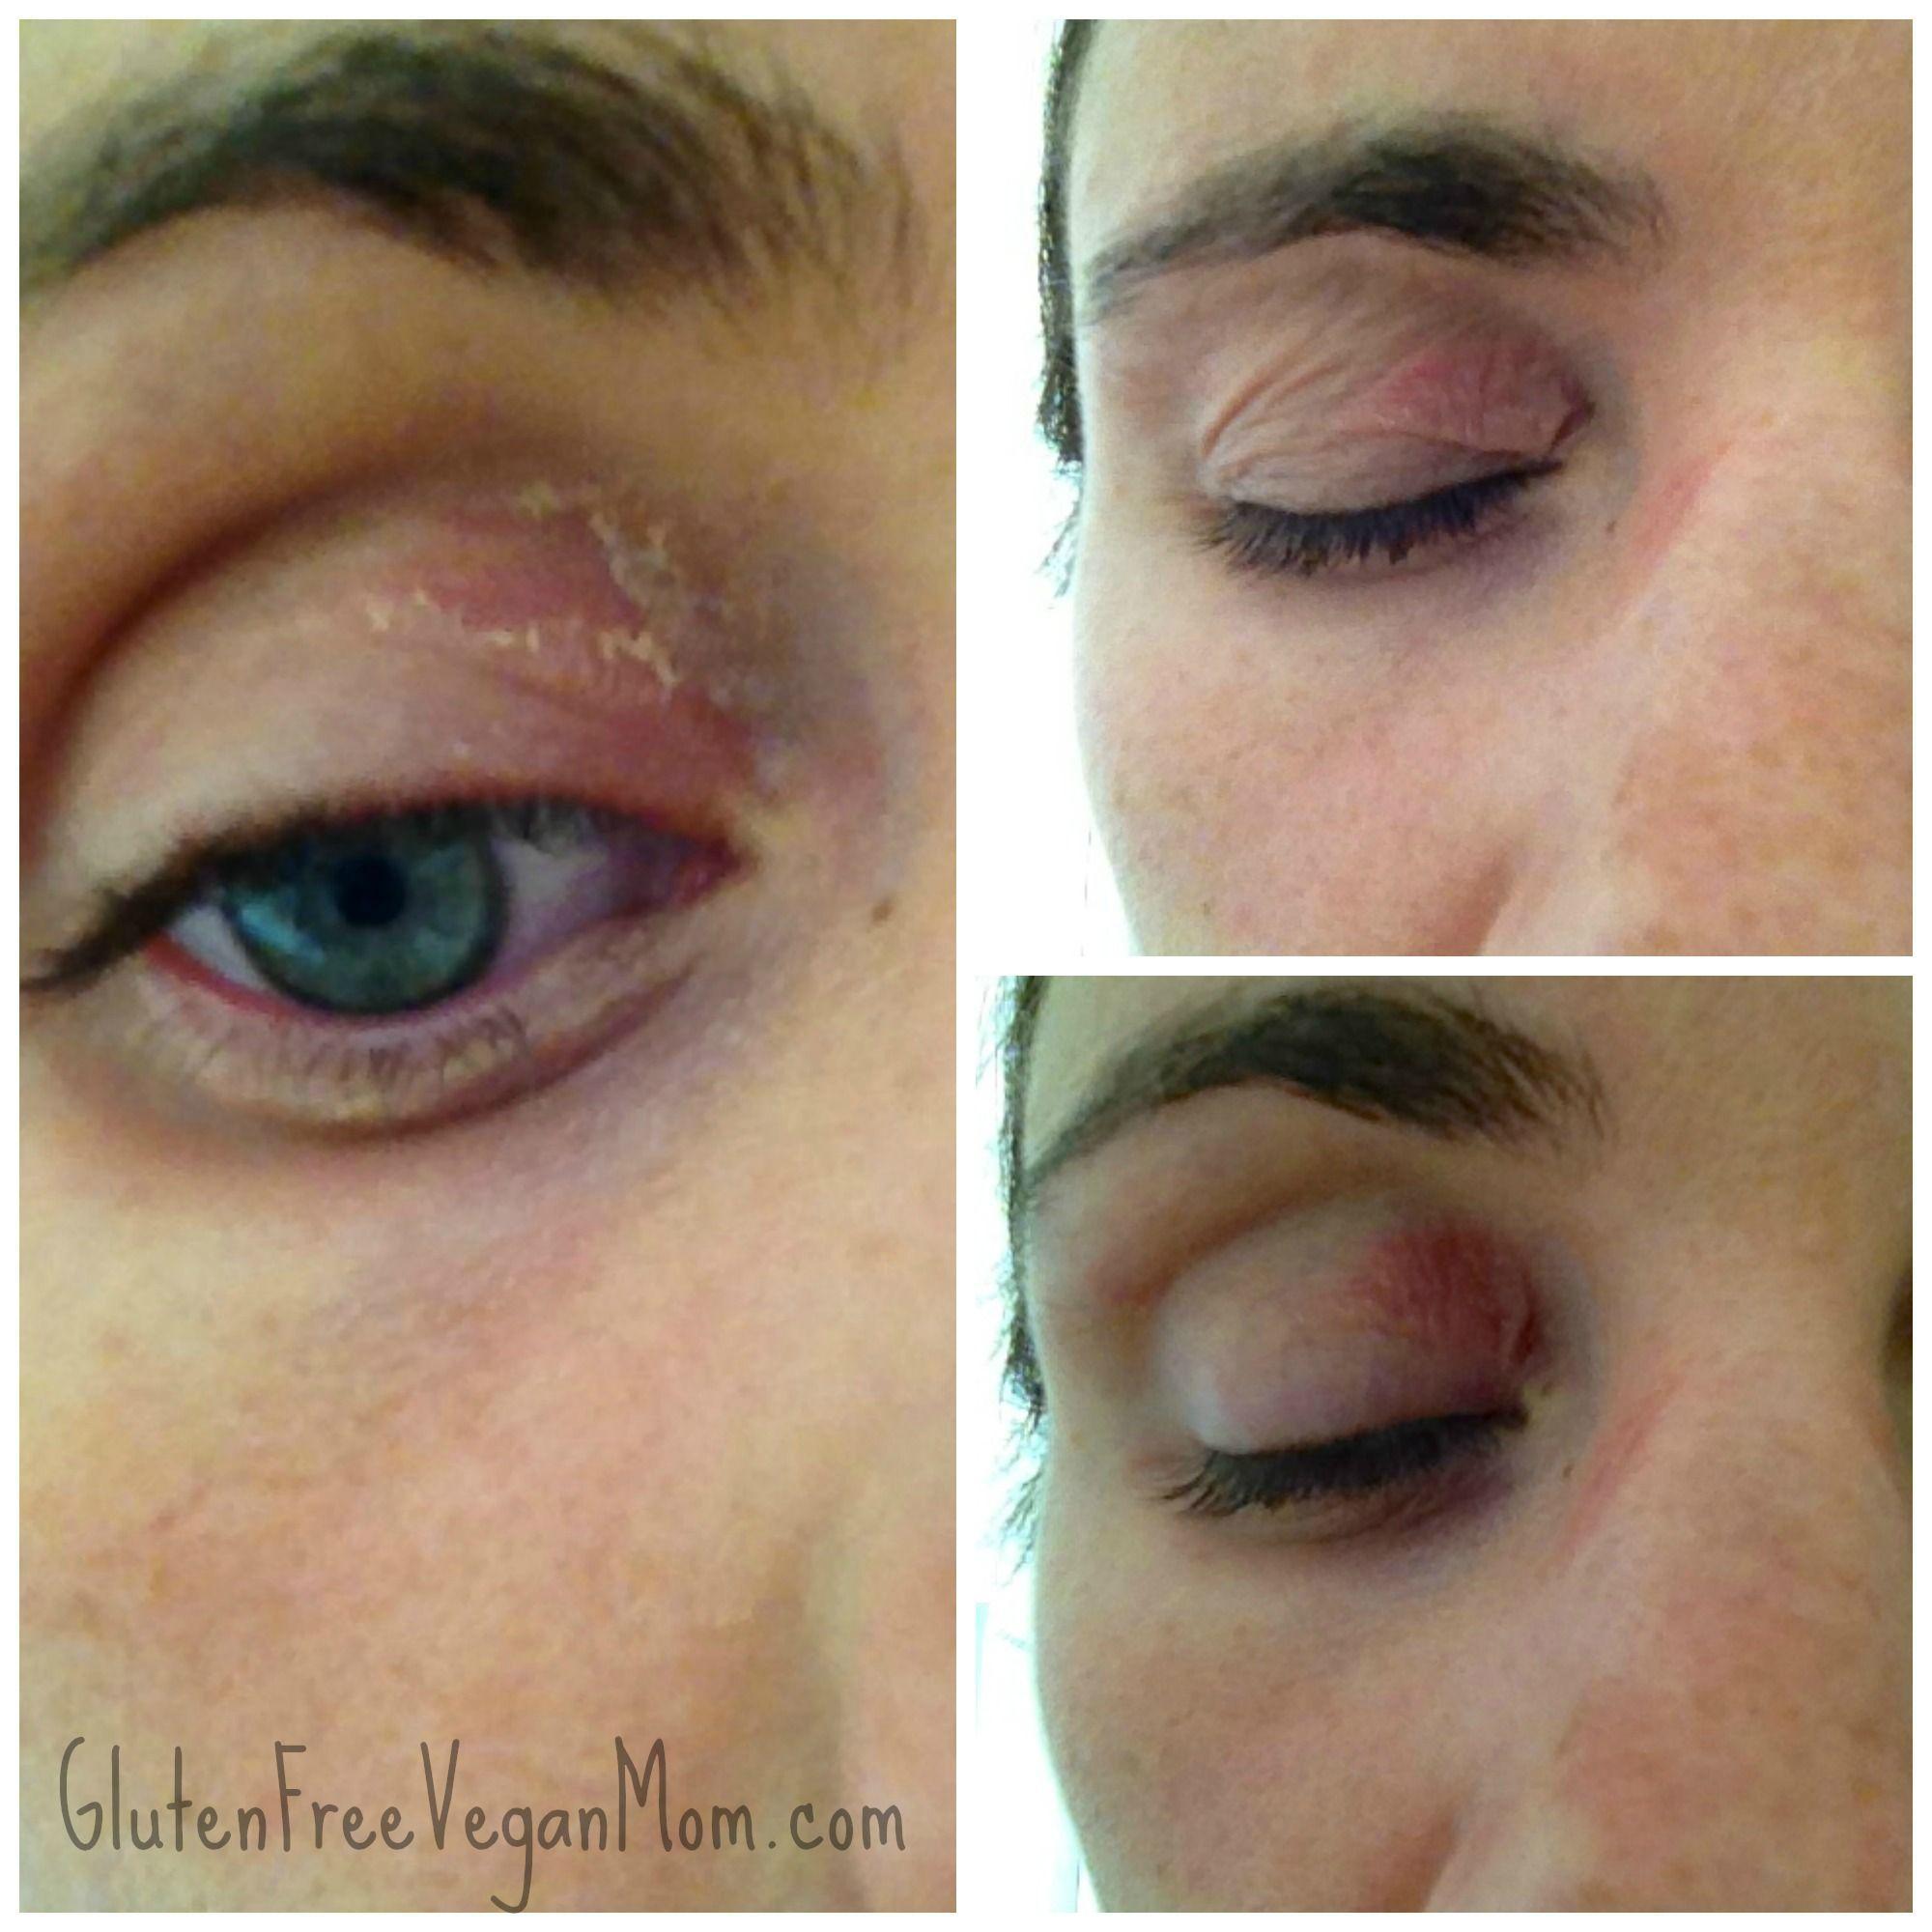 My Nickel Allergy Triggers My Eczema Flareups Nickel In Food